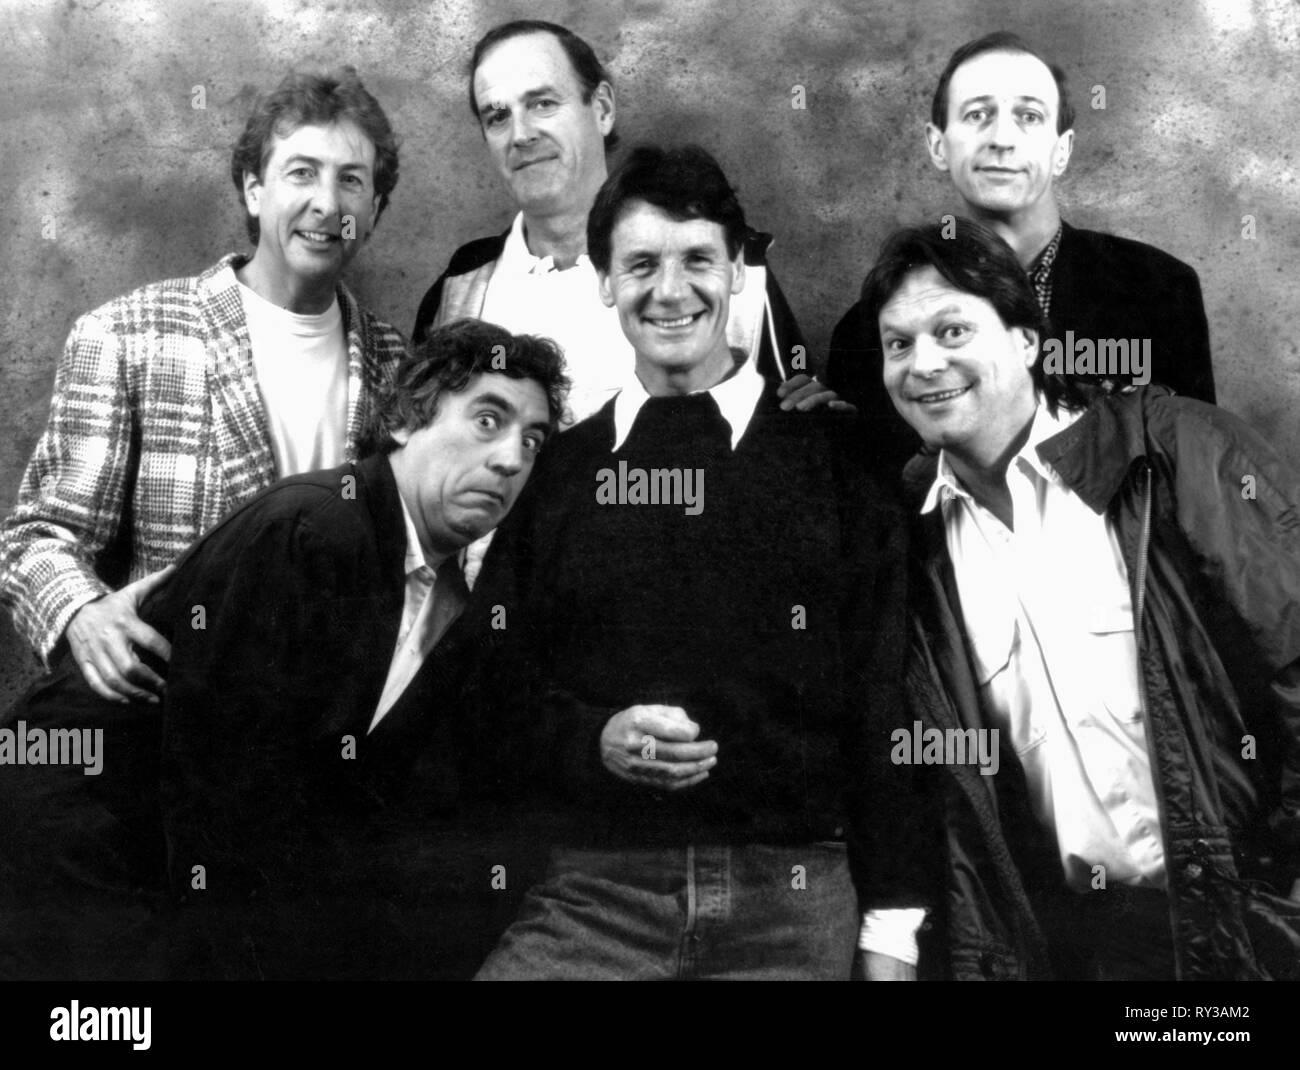 IDLE,CLEESE,CHAPMAN,JONES,PALIN,GILLIAM, TWENTY YEARS OF MONTY PYTHON, 1989 - Stock Image